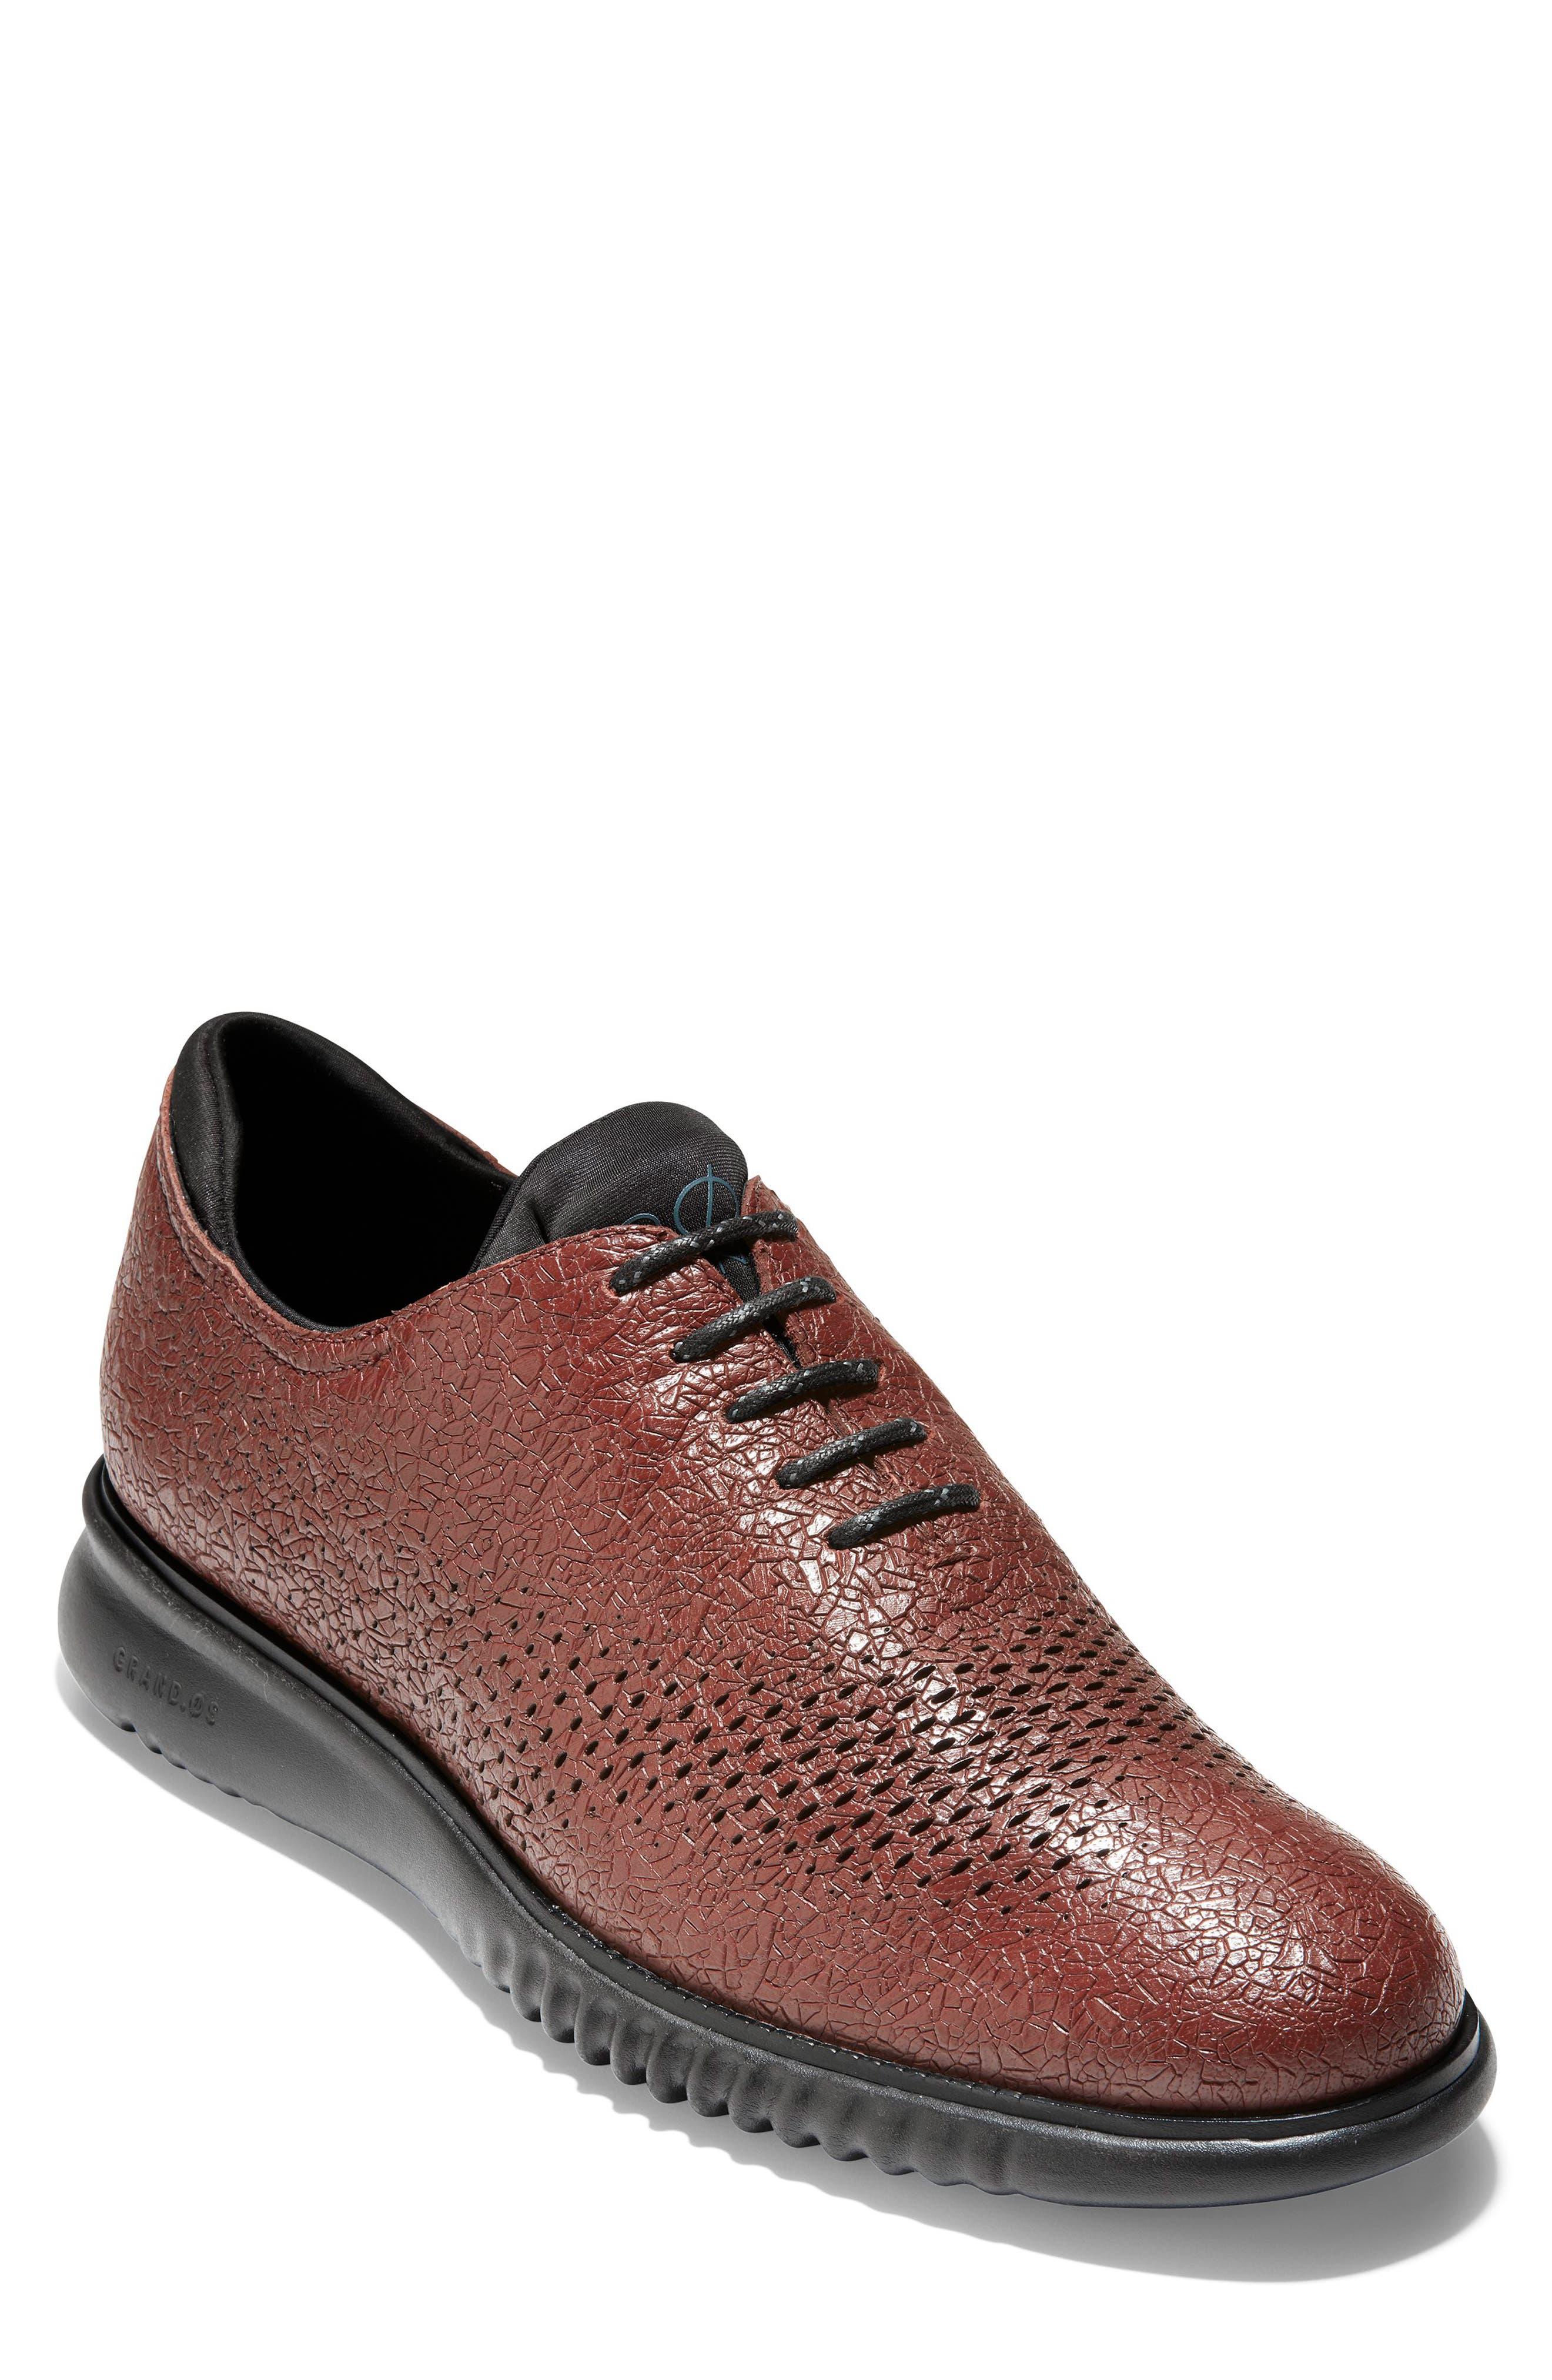 2.ZeroGrand Wingtip,                         Main,                         color, Hickory/ Black Leather